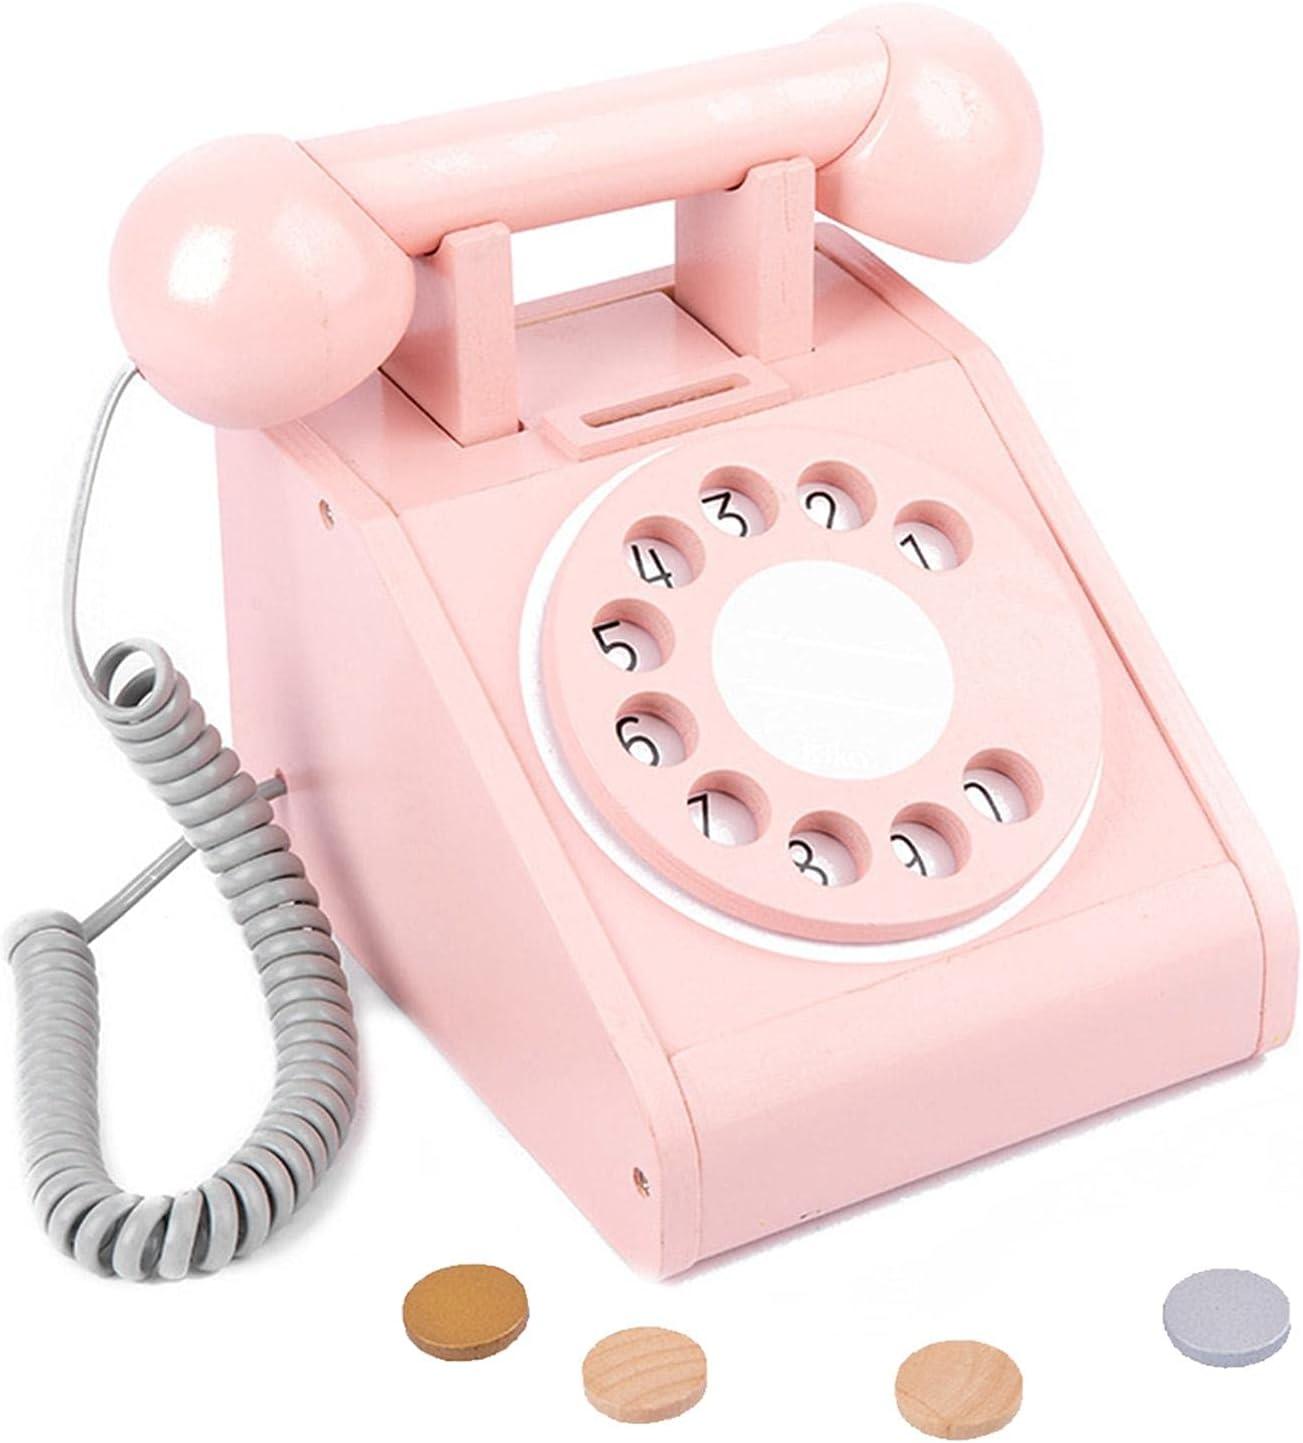 M B Kid Telephone Toy Retro Teaching Max Cheap mail order shopping 89% OFF Children's Si